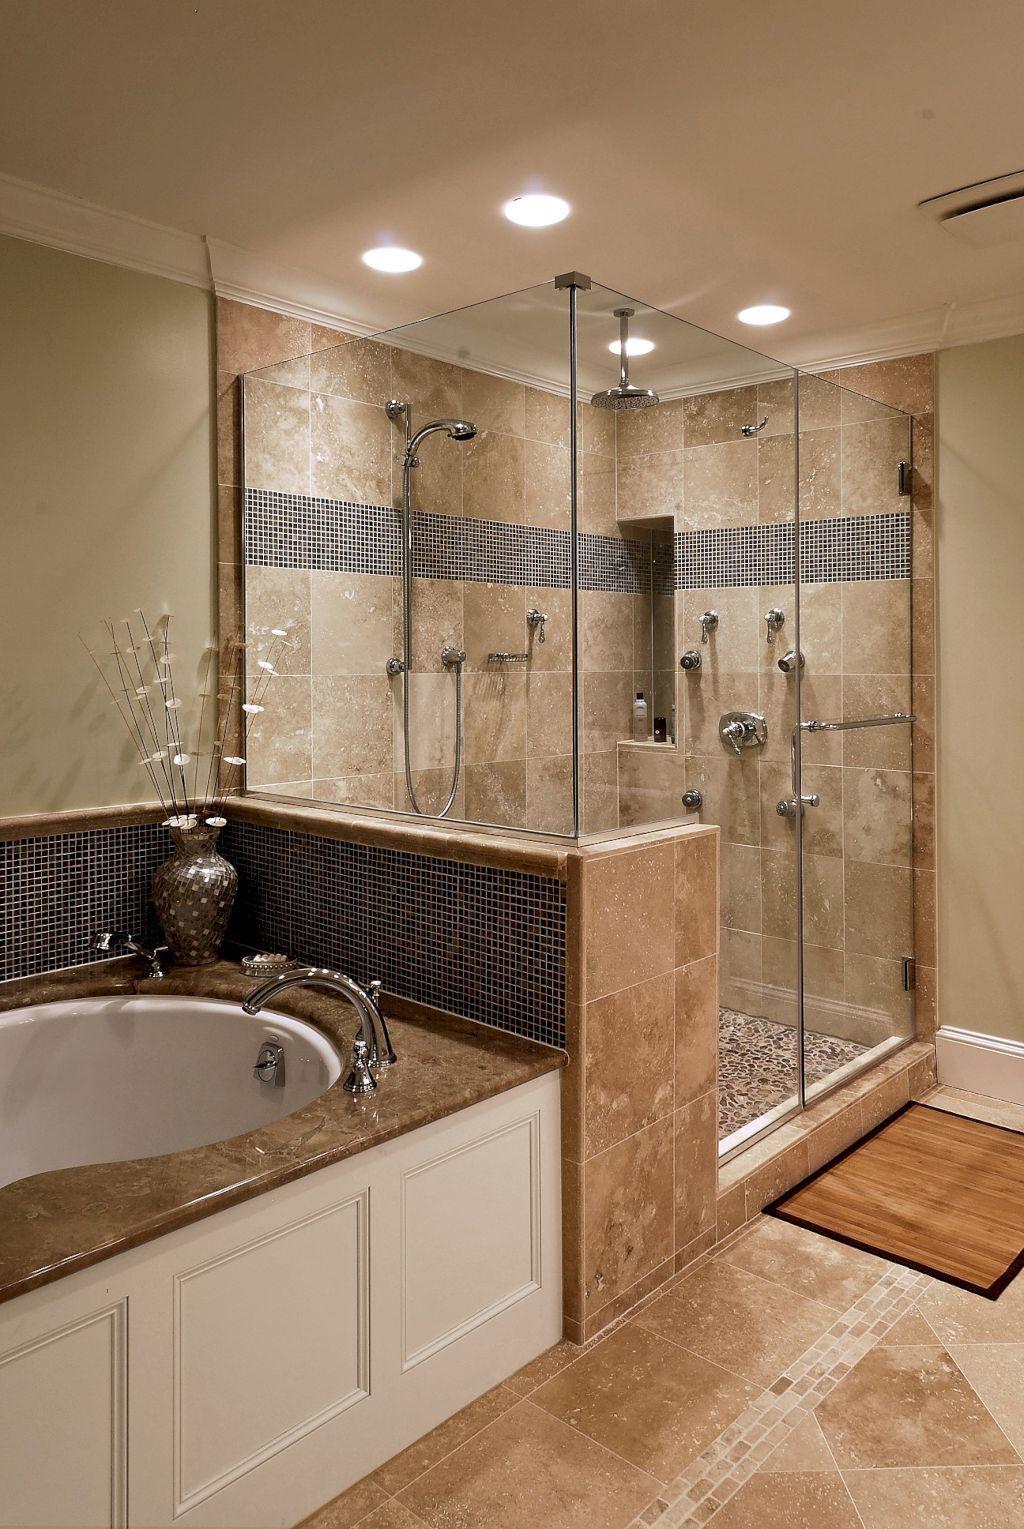 awesome master bathroom ideas | Awesome master bathroom ideas (5) | Bathroom, Master ...